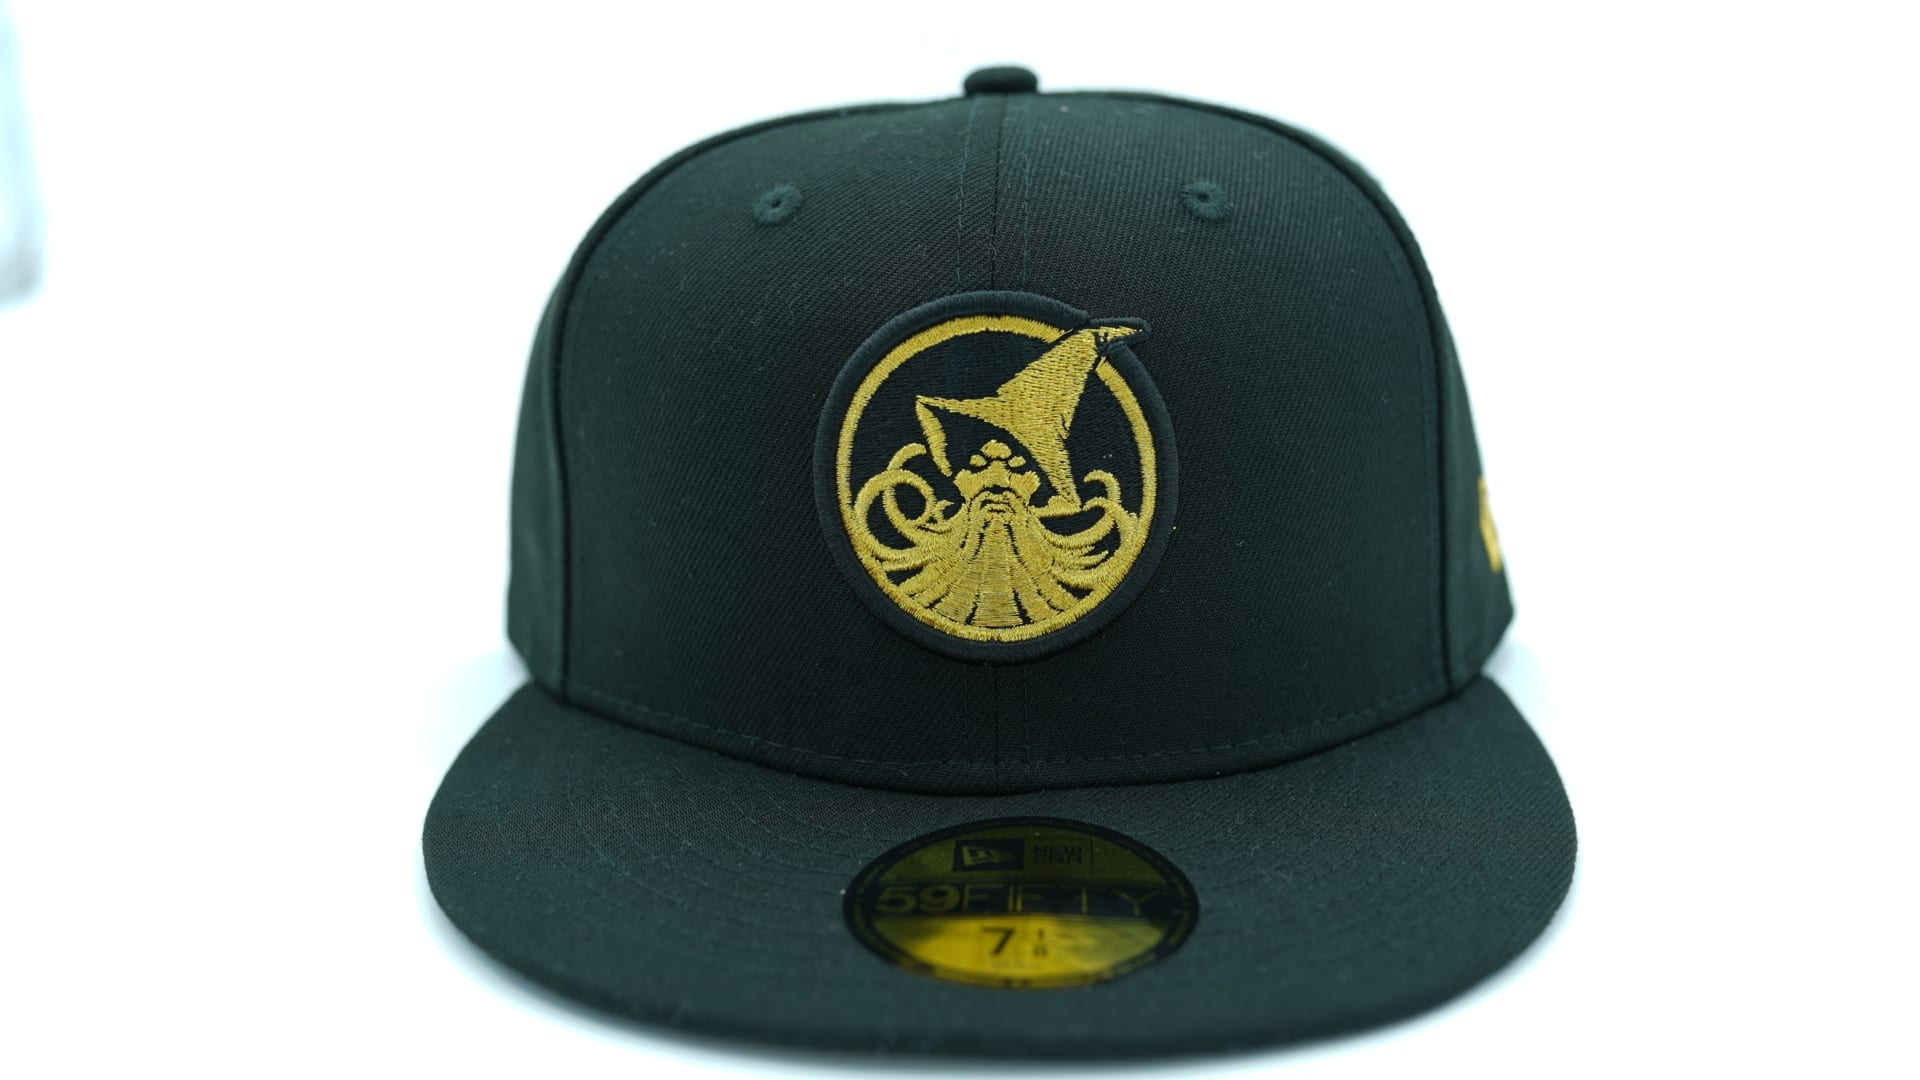 19373ef1d6f new york yankees hat logo gold 59fifty fitted baseball cap new era mlb